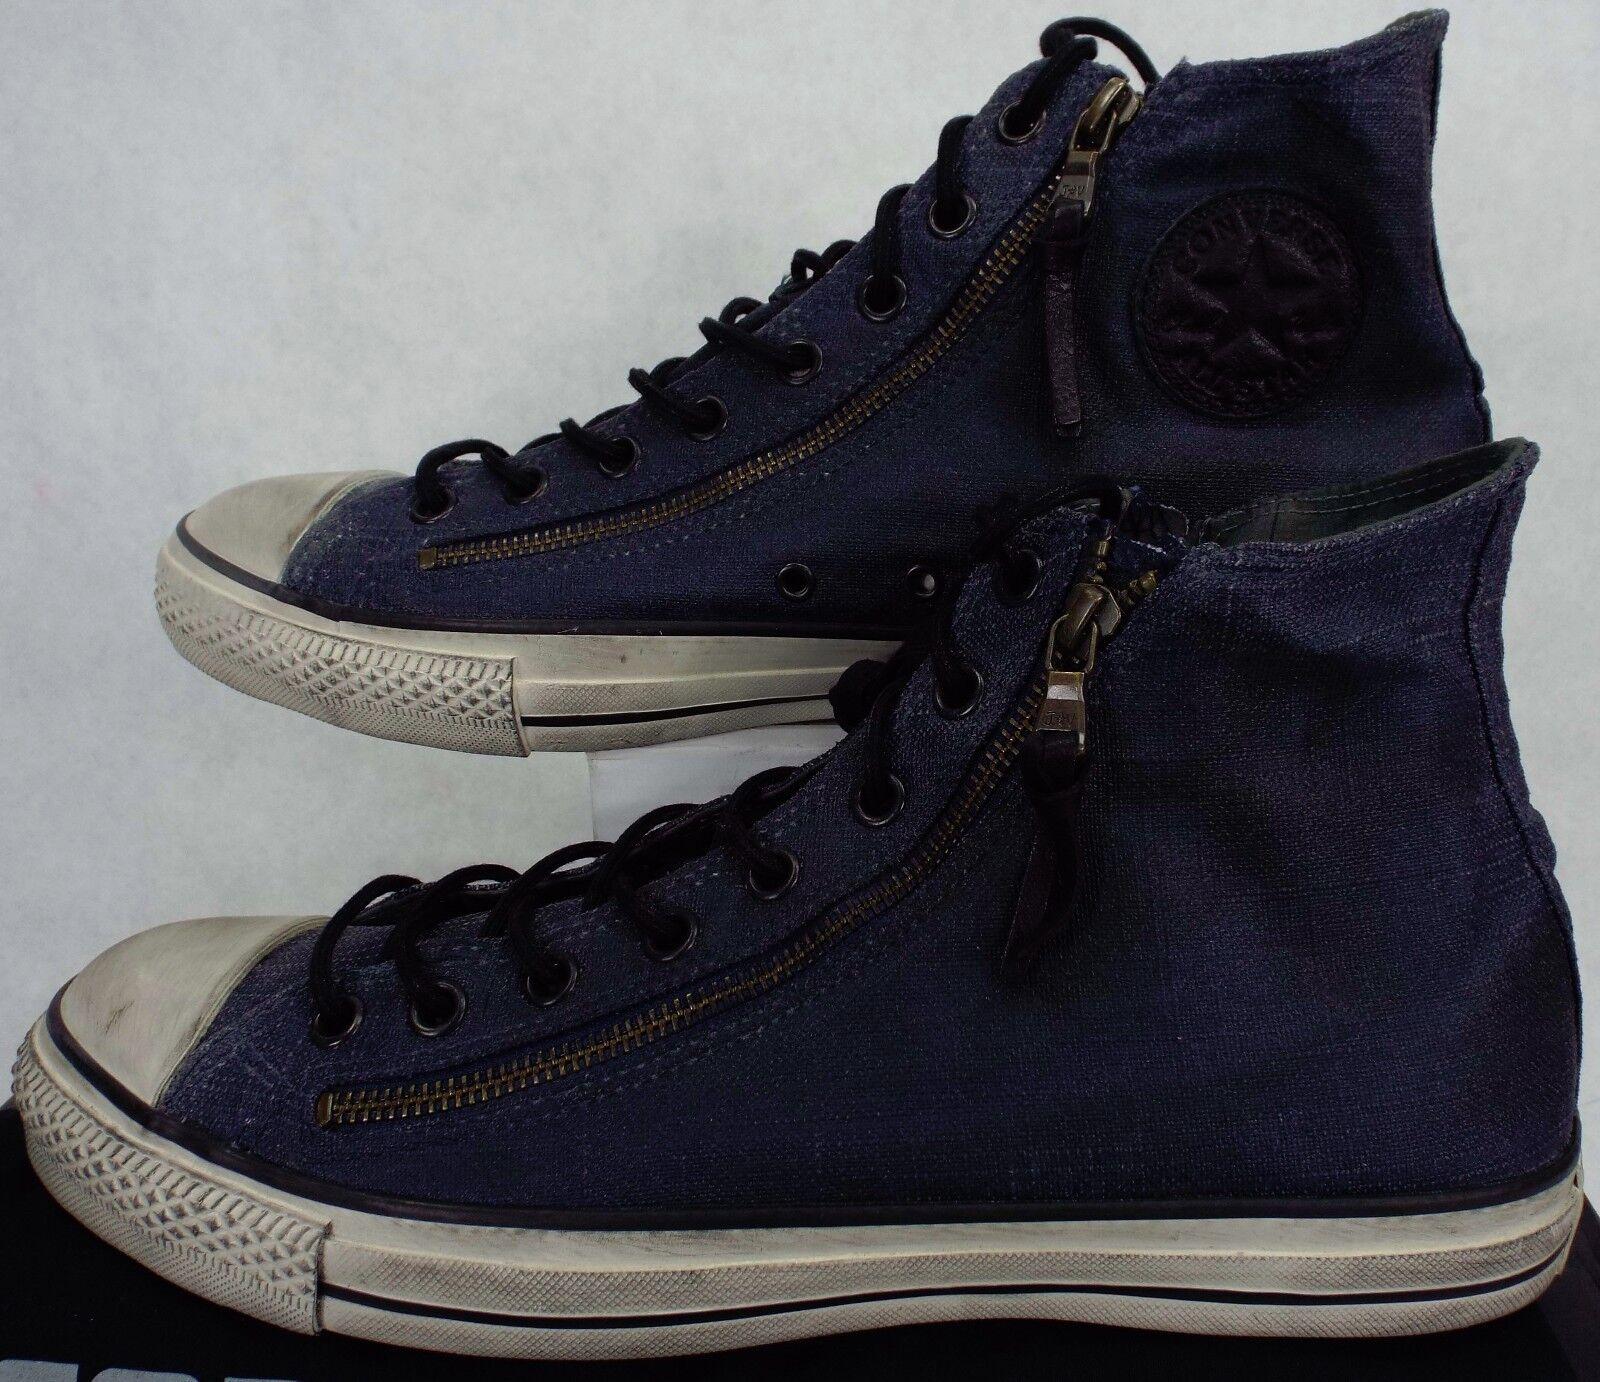 Mens 11.5 CONVERSE John Varvatos CT HI Double Zip Ink Beluga Shoes    150168C